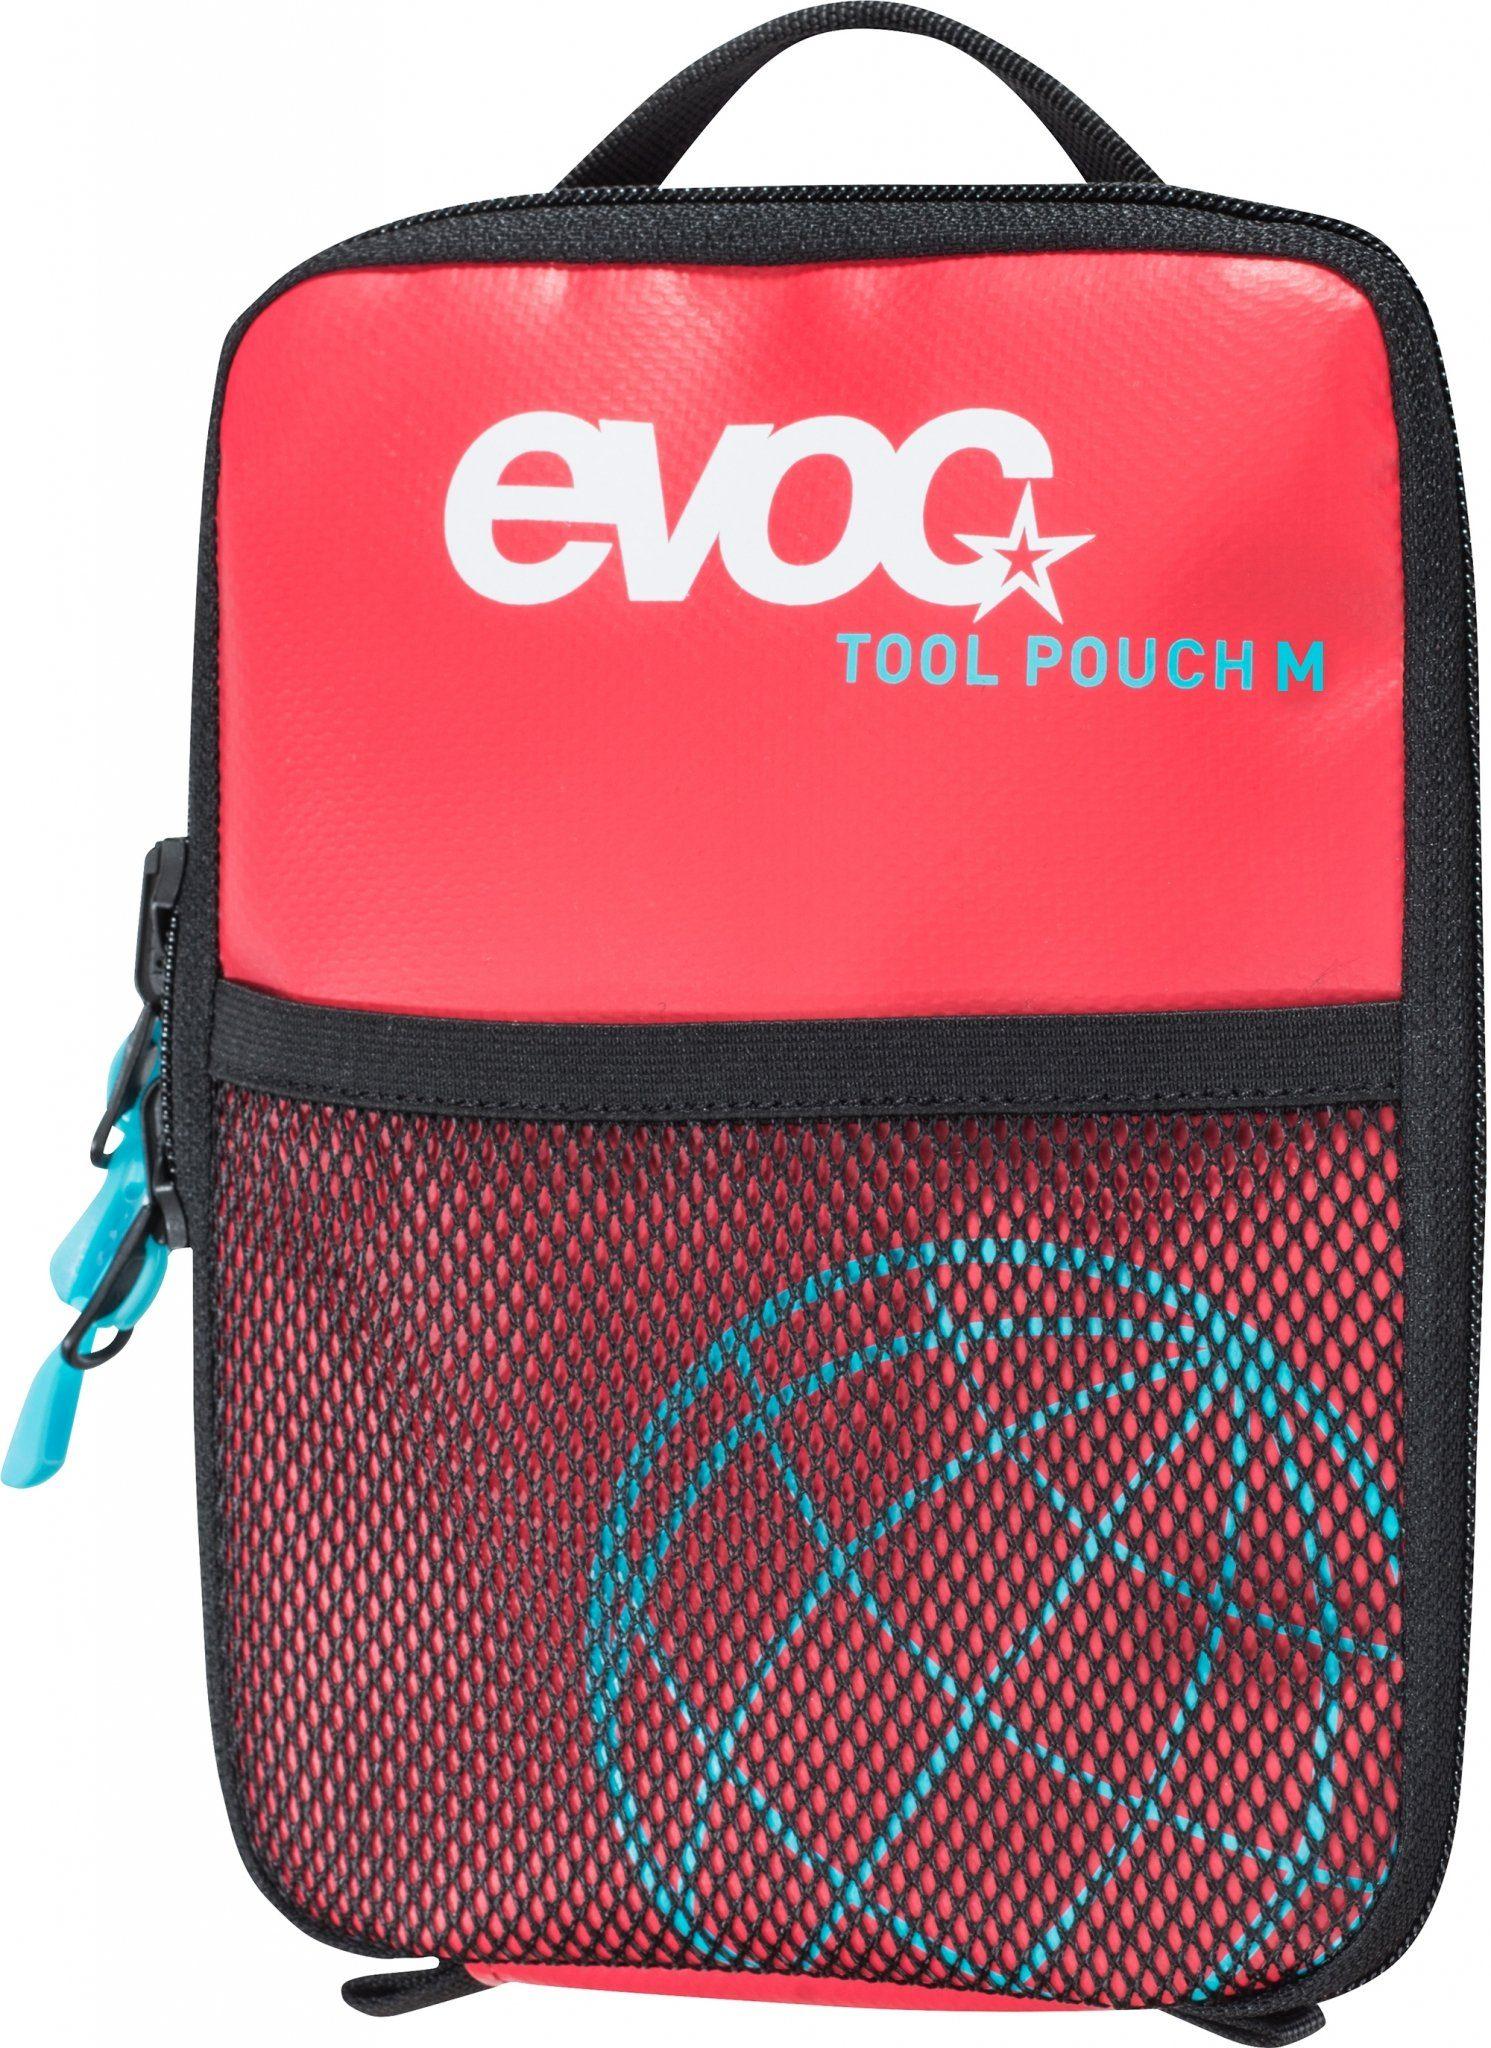 EVOC Fahrradtasche »Tool Pouch M«